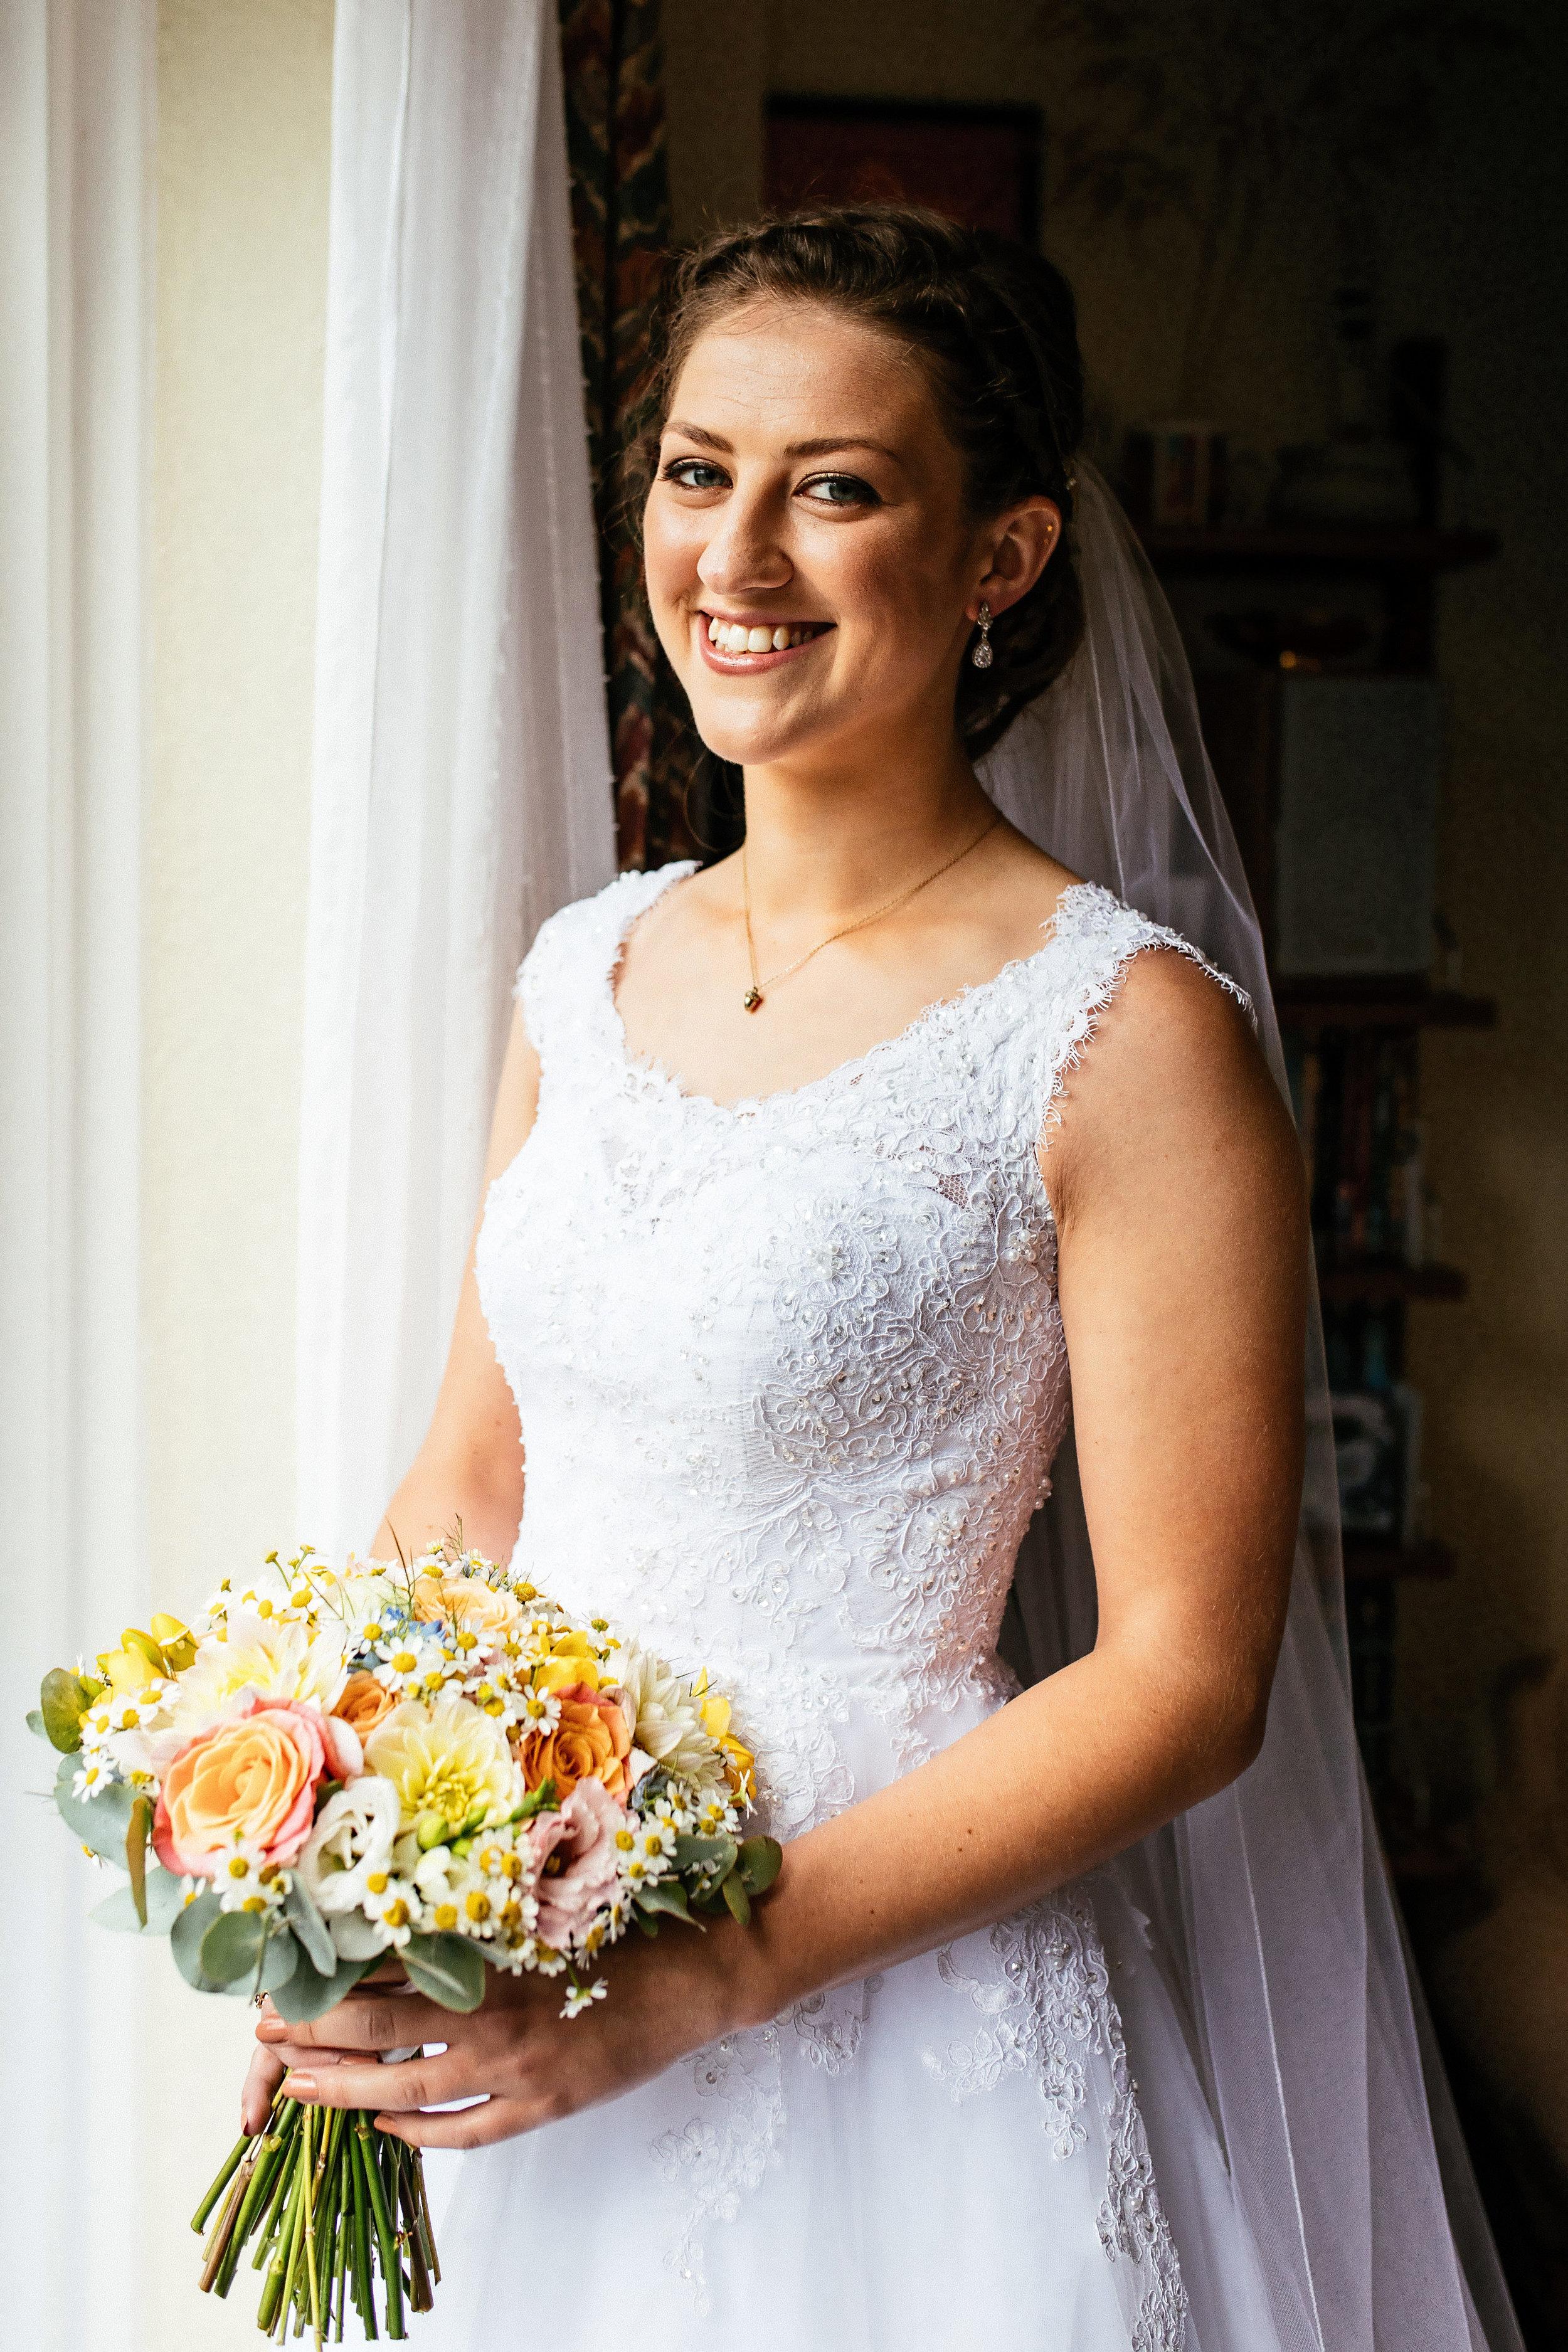 Kathryn-and-Mike-Wedding-Highlights-10.jpg